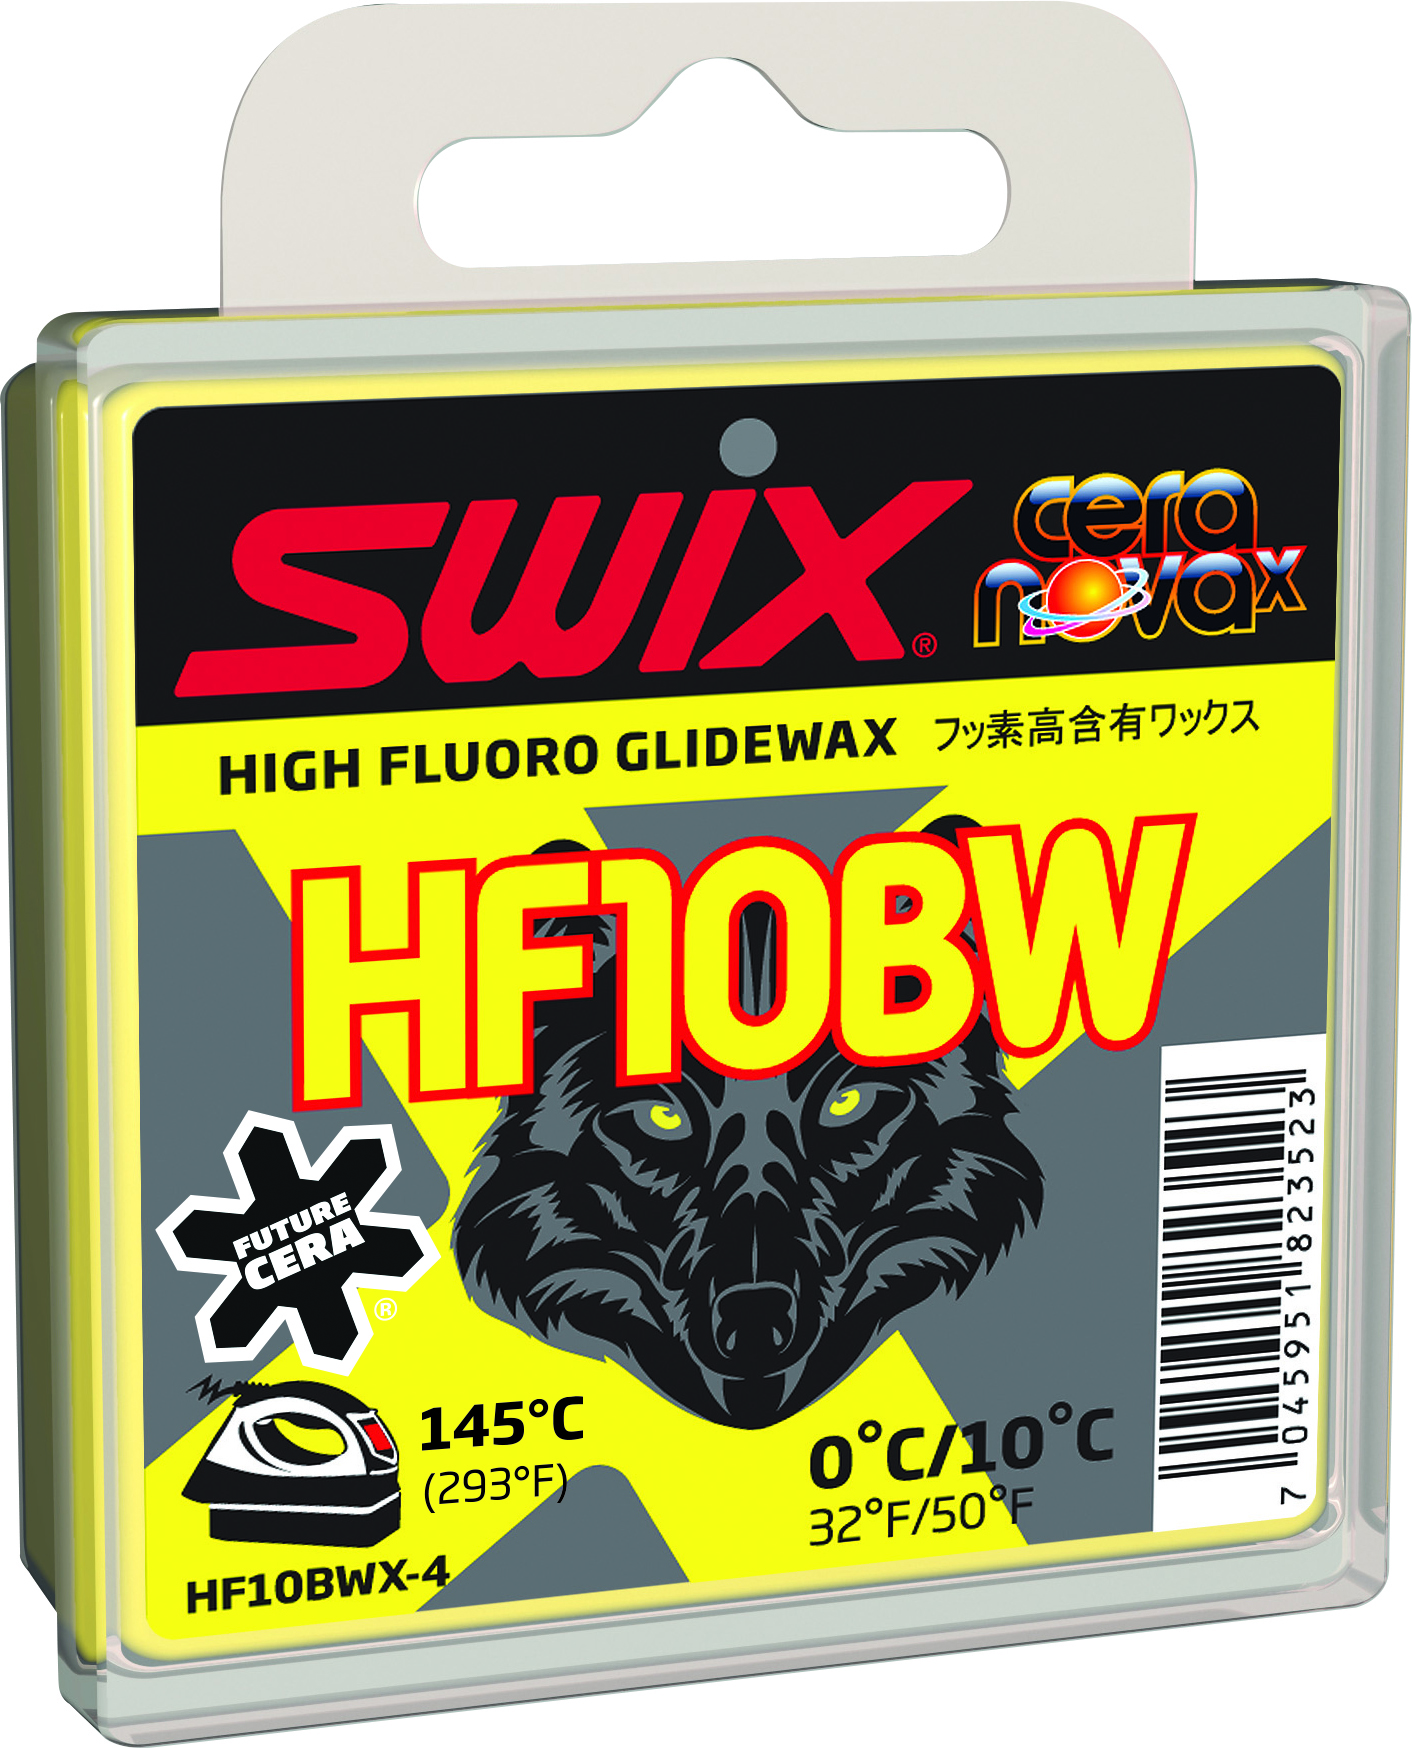 Swix Мазь скольжения Swix HF10BW, 0C/+10C все цены